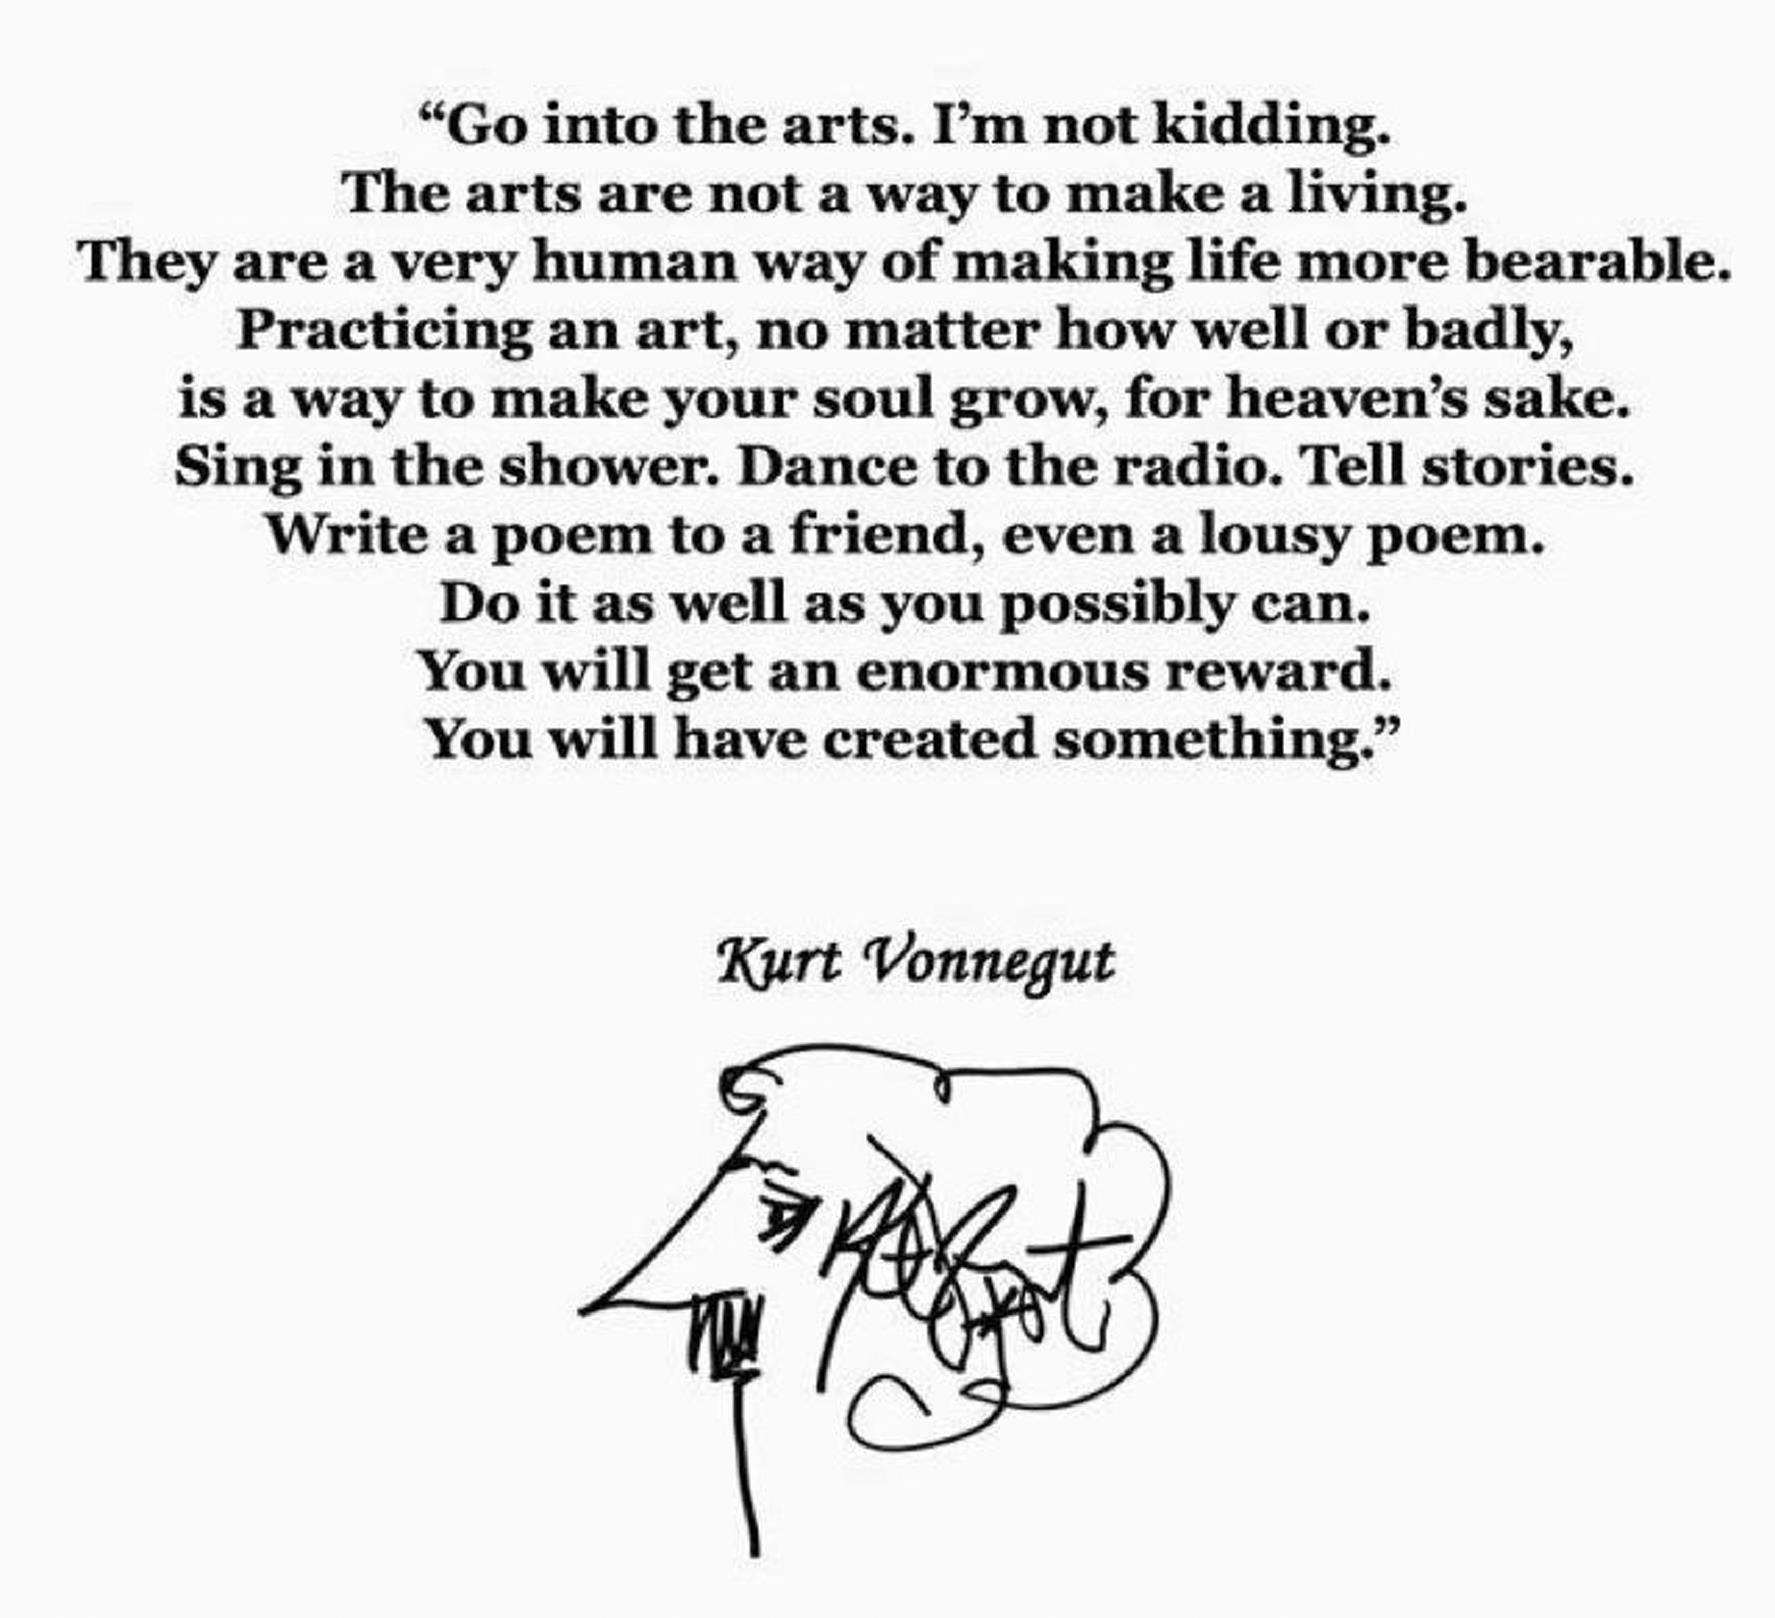 Kurt Vonnegut's quote #8